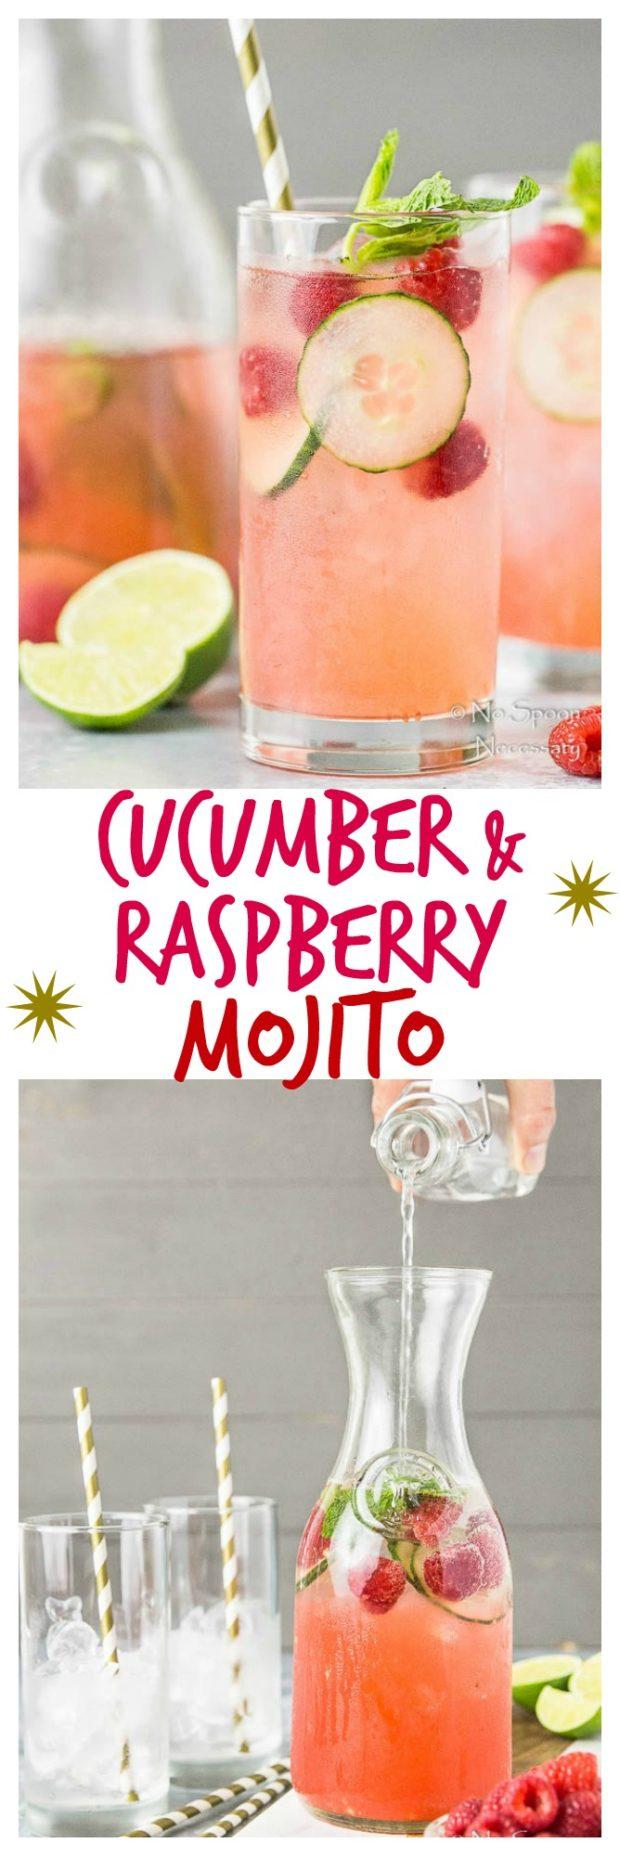 Cucumber & Raspberry Mojito-long pin1